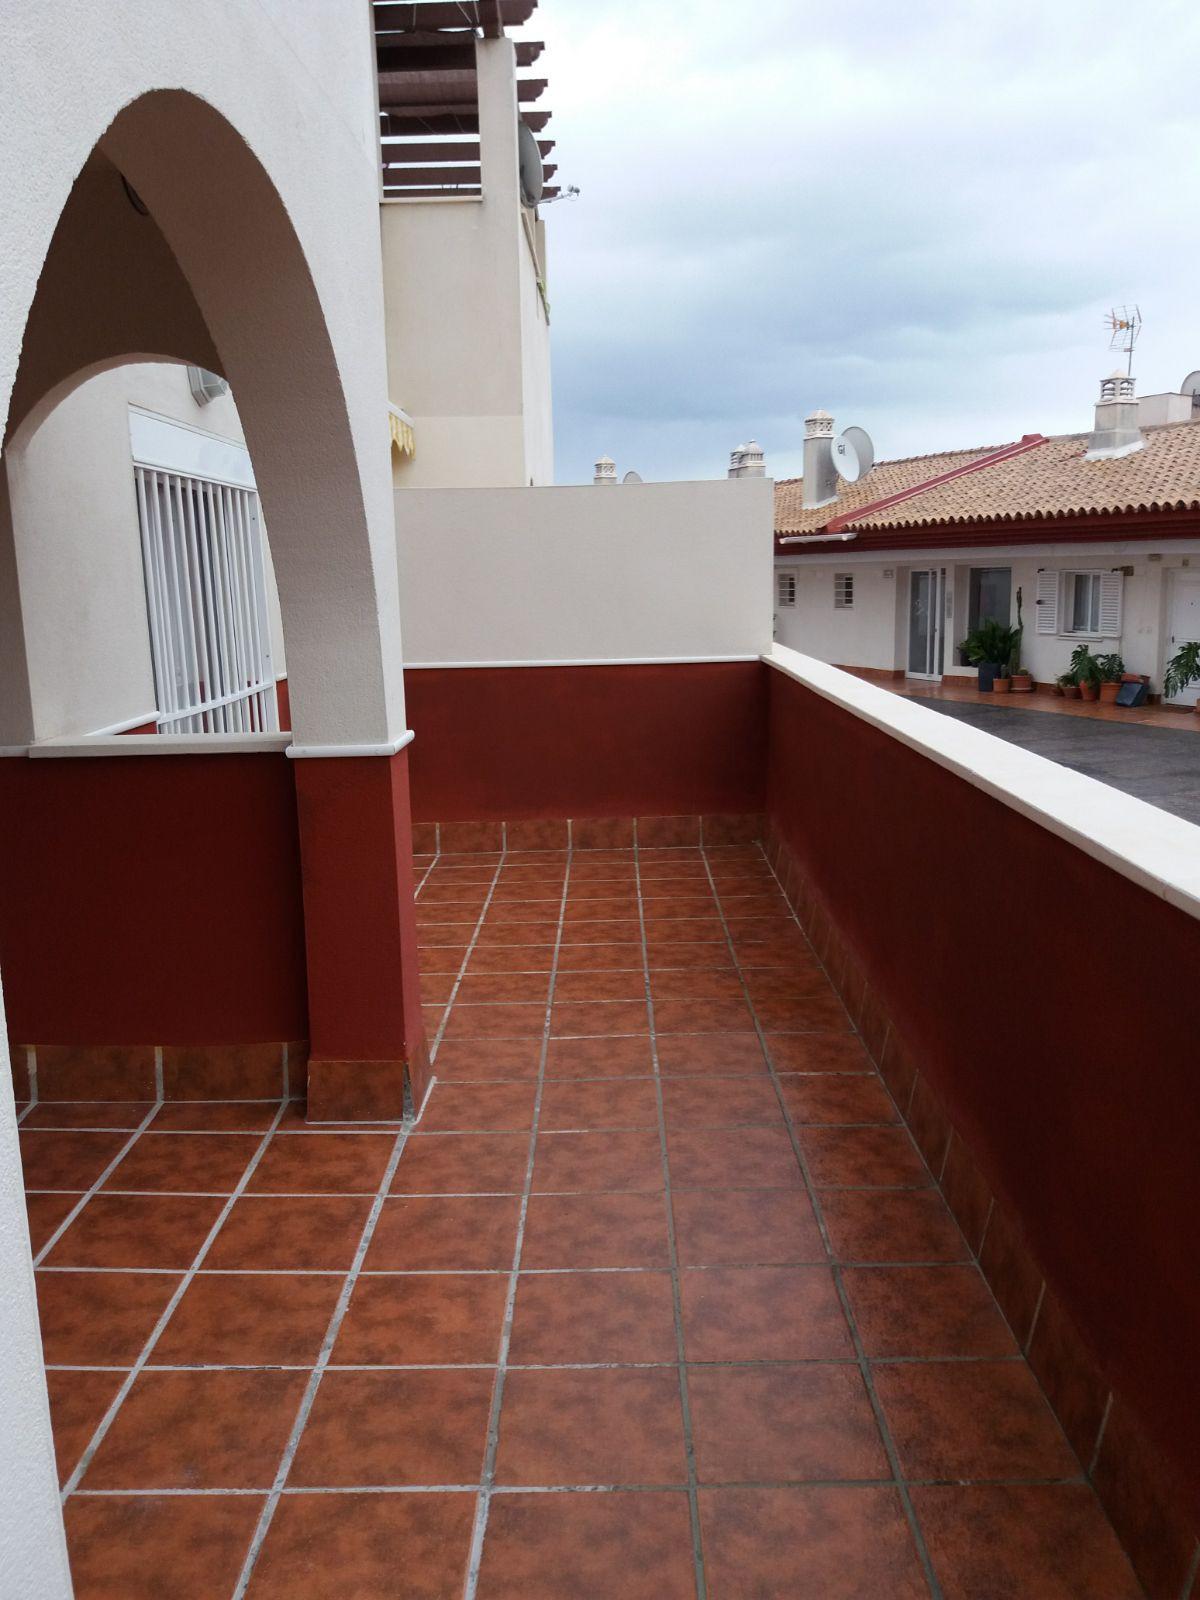 BARGAIN!!! - Beautiful apartment in Benalmadena pueblo, very easy and short walk to all amenities, b,Spain